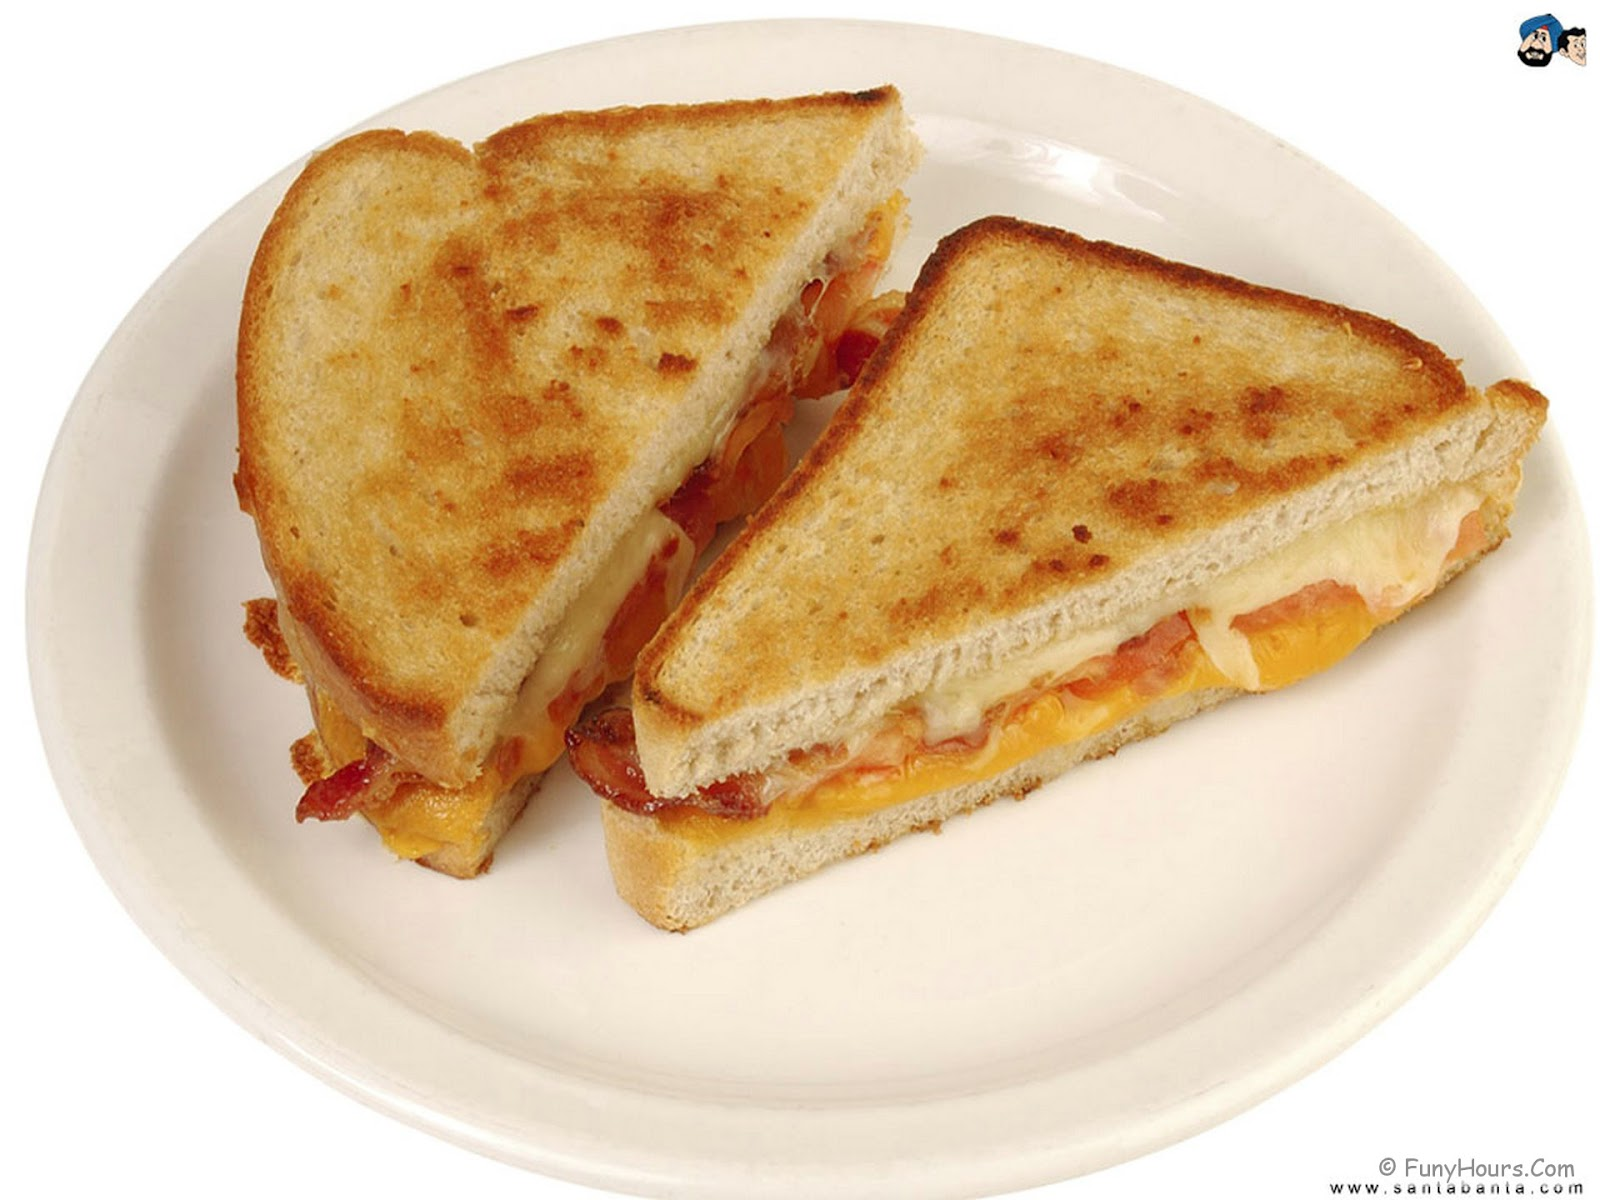 http://3.bp.blogspot.com/-D_EahJILF8A/UB40QrmnSmI/AAAAAAAABMQ/xQqxdbofuU8/s1600/Snacks-7.jpg